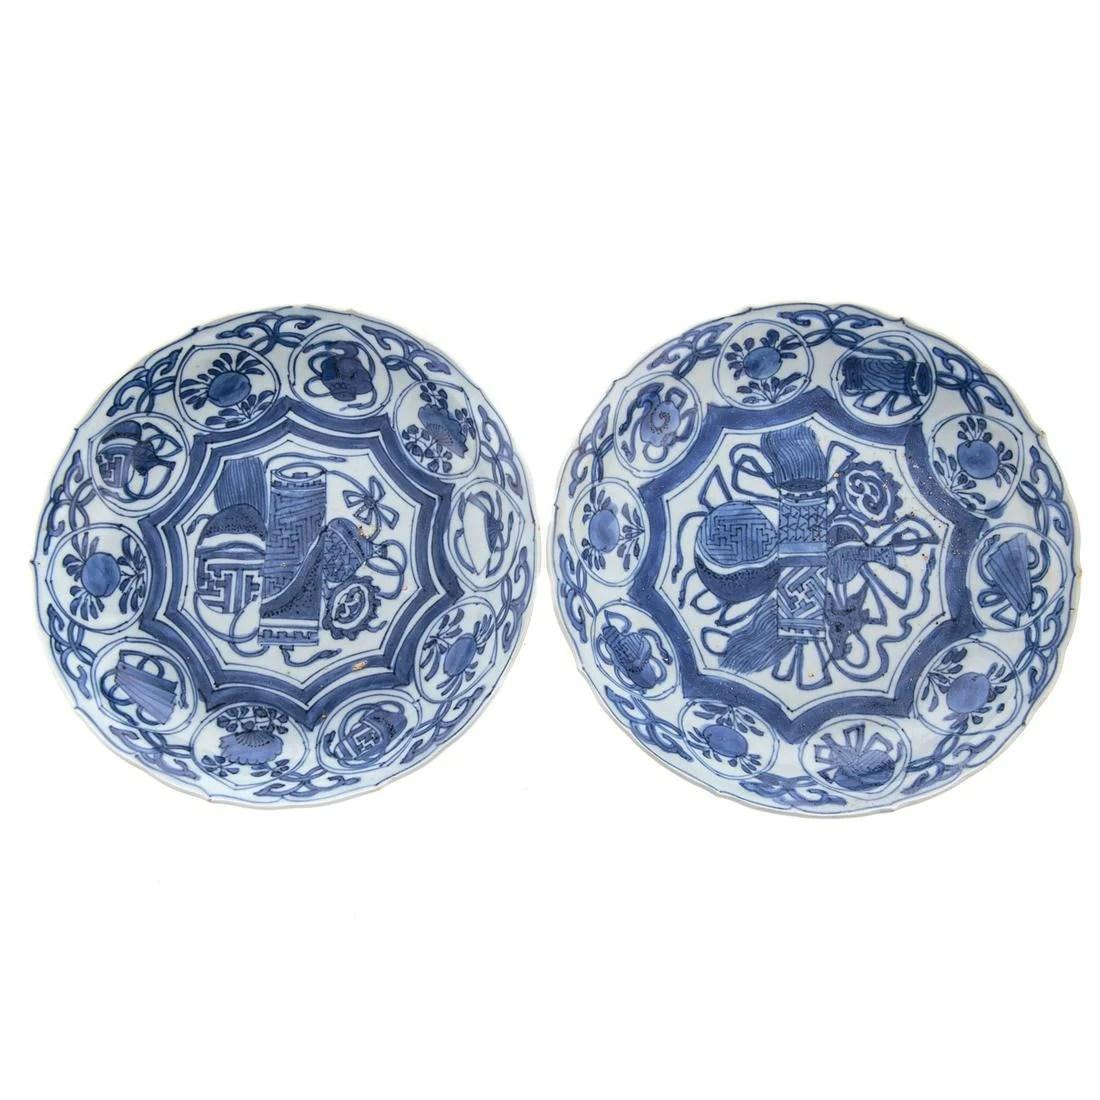 Pair of Chinese Kraak Ware Bowls